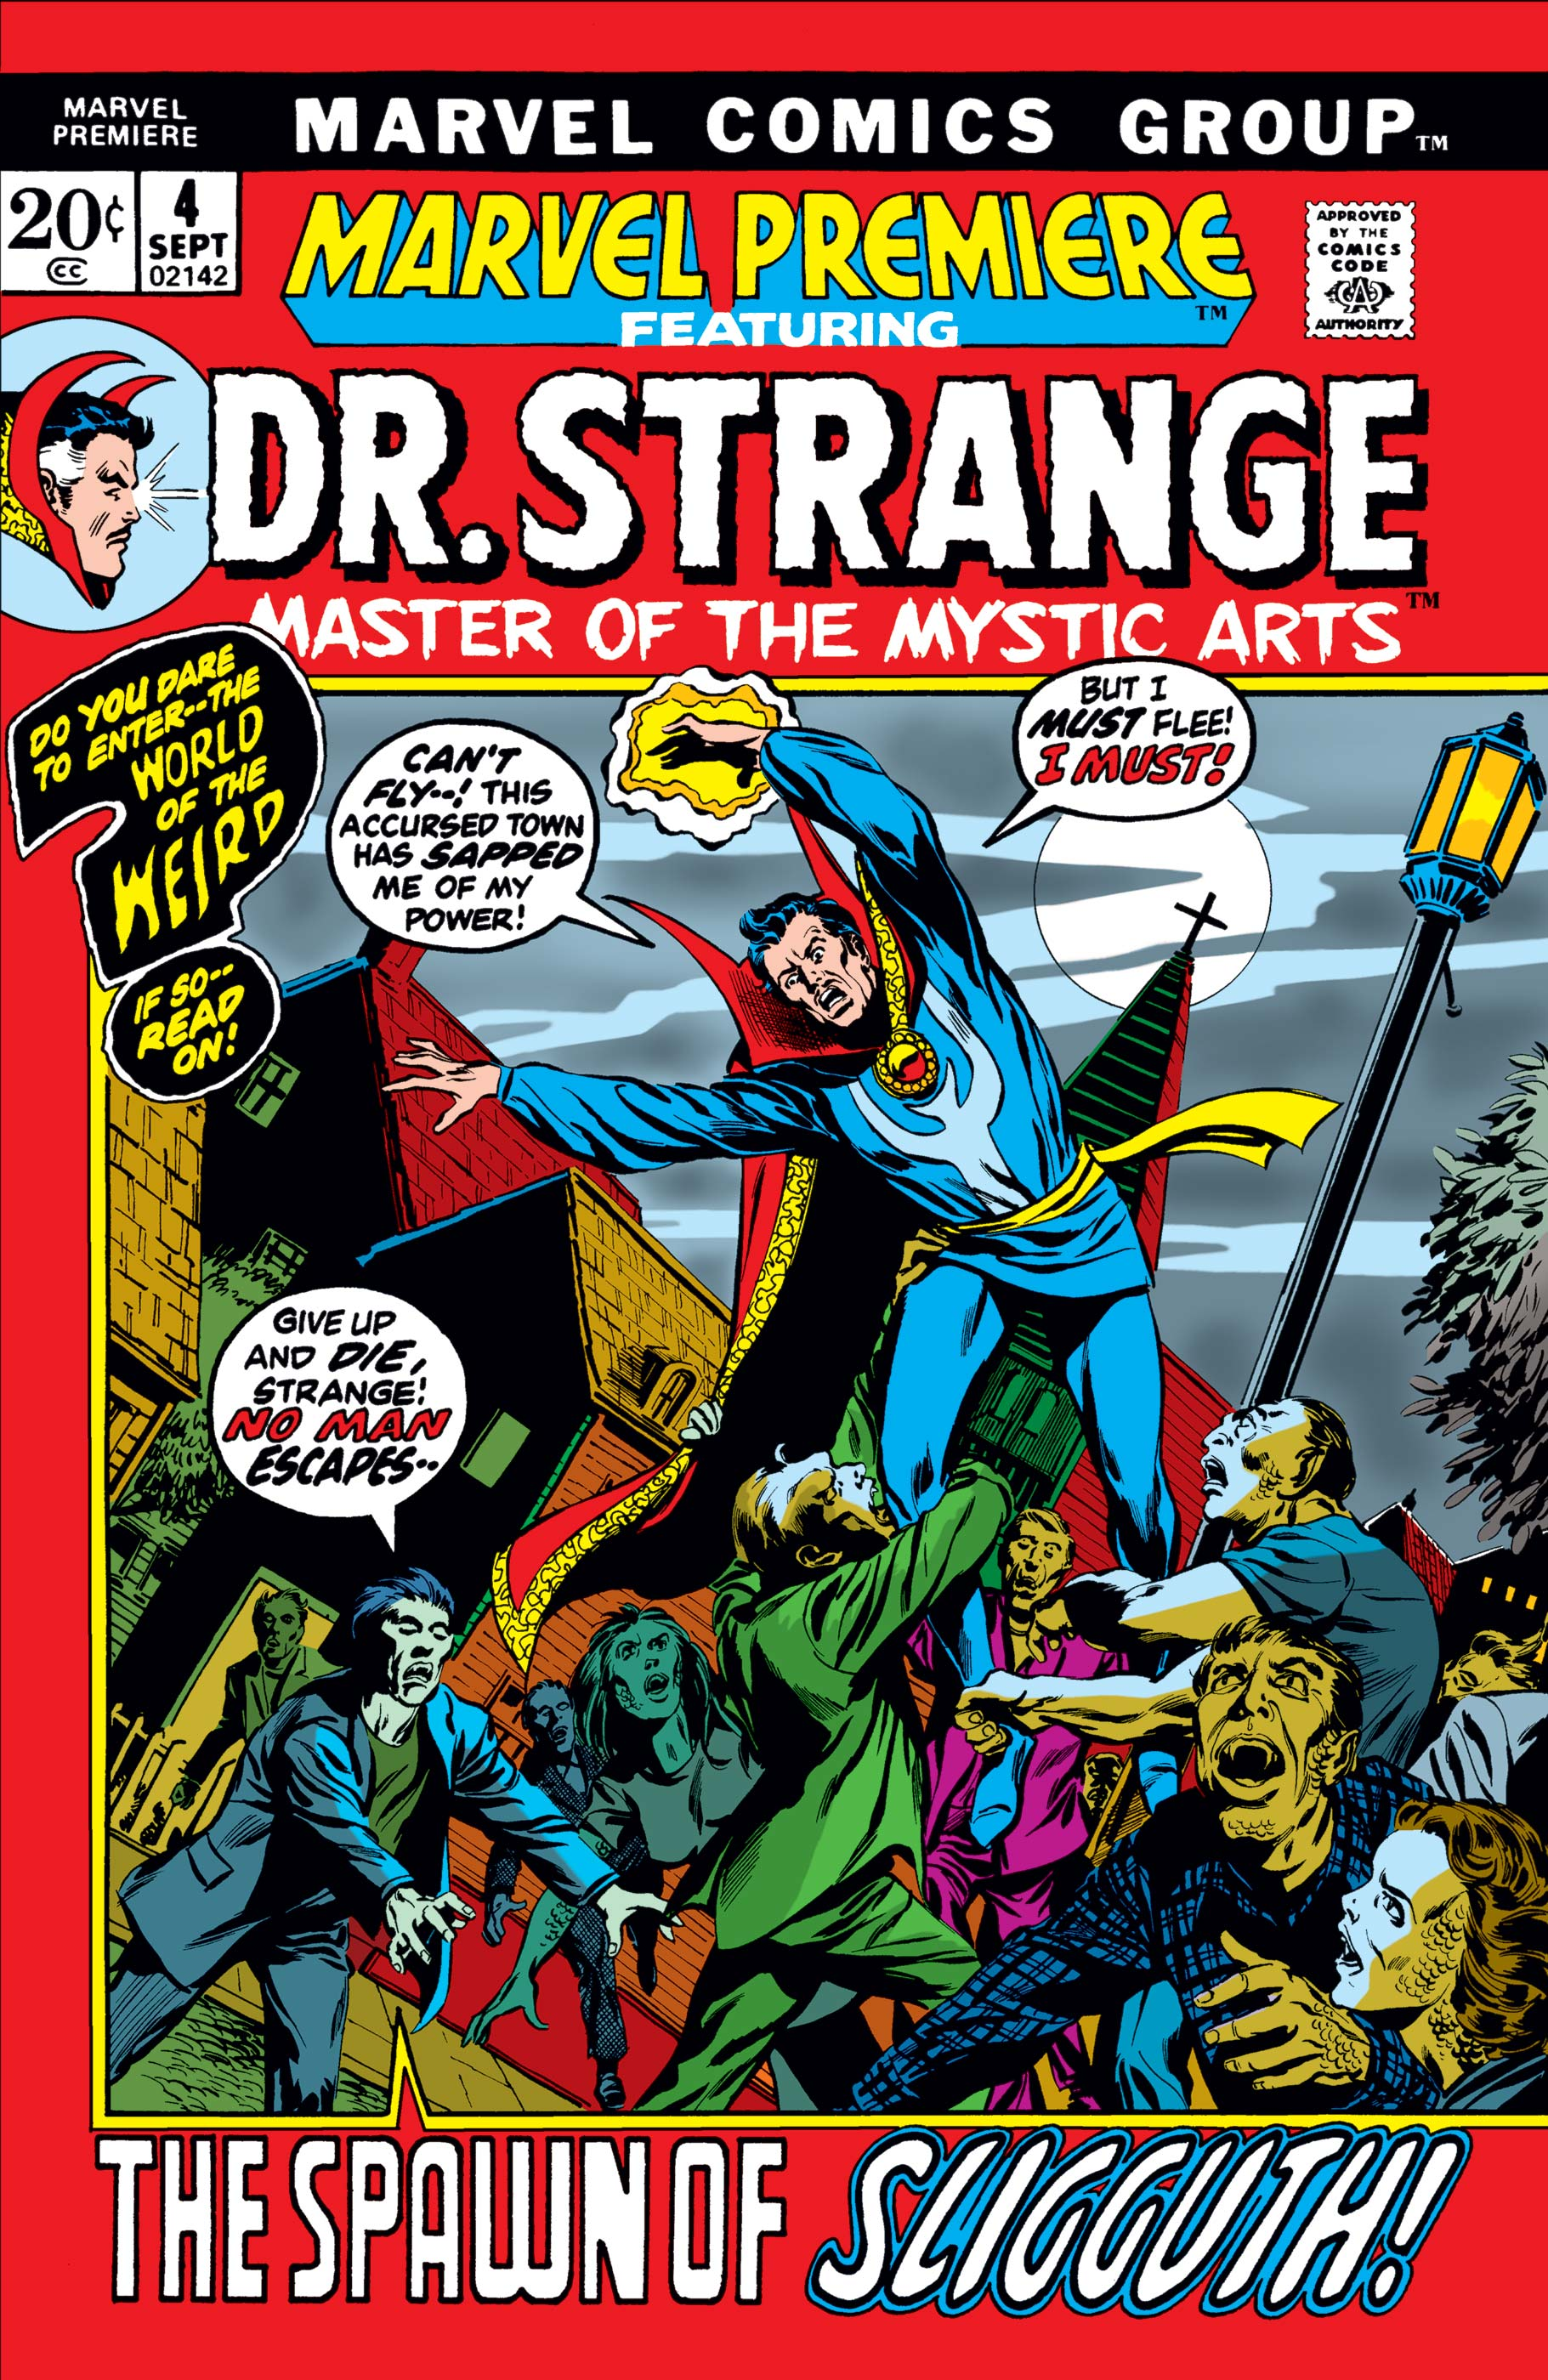 Marvel Premiere (1972) #4